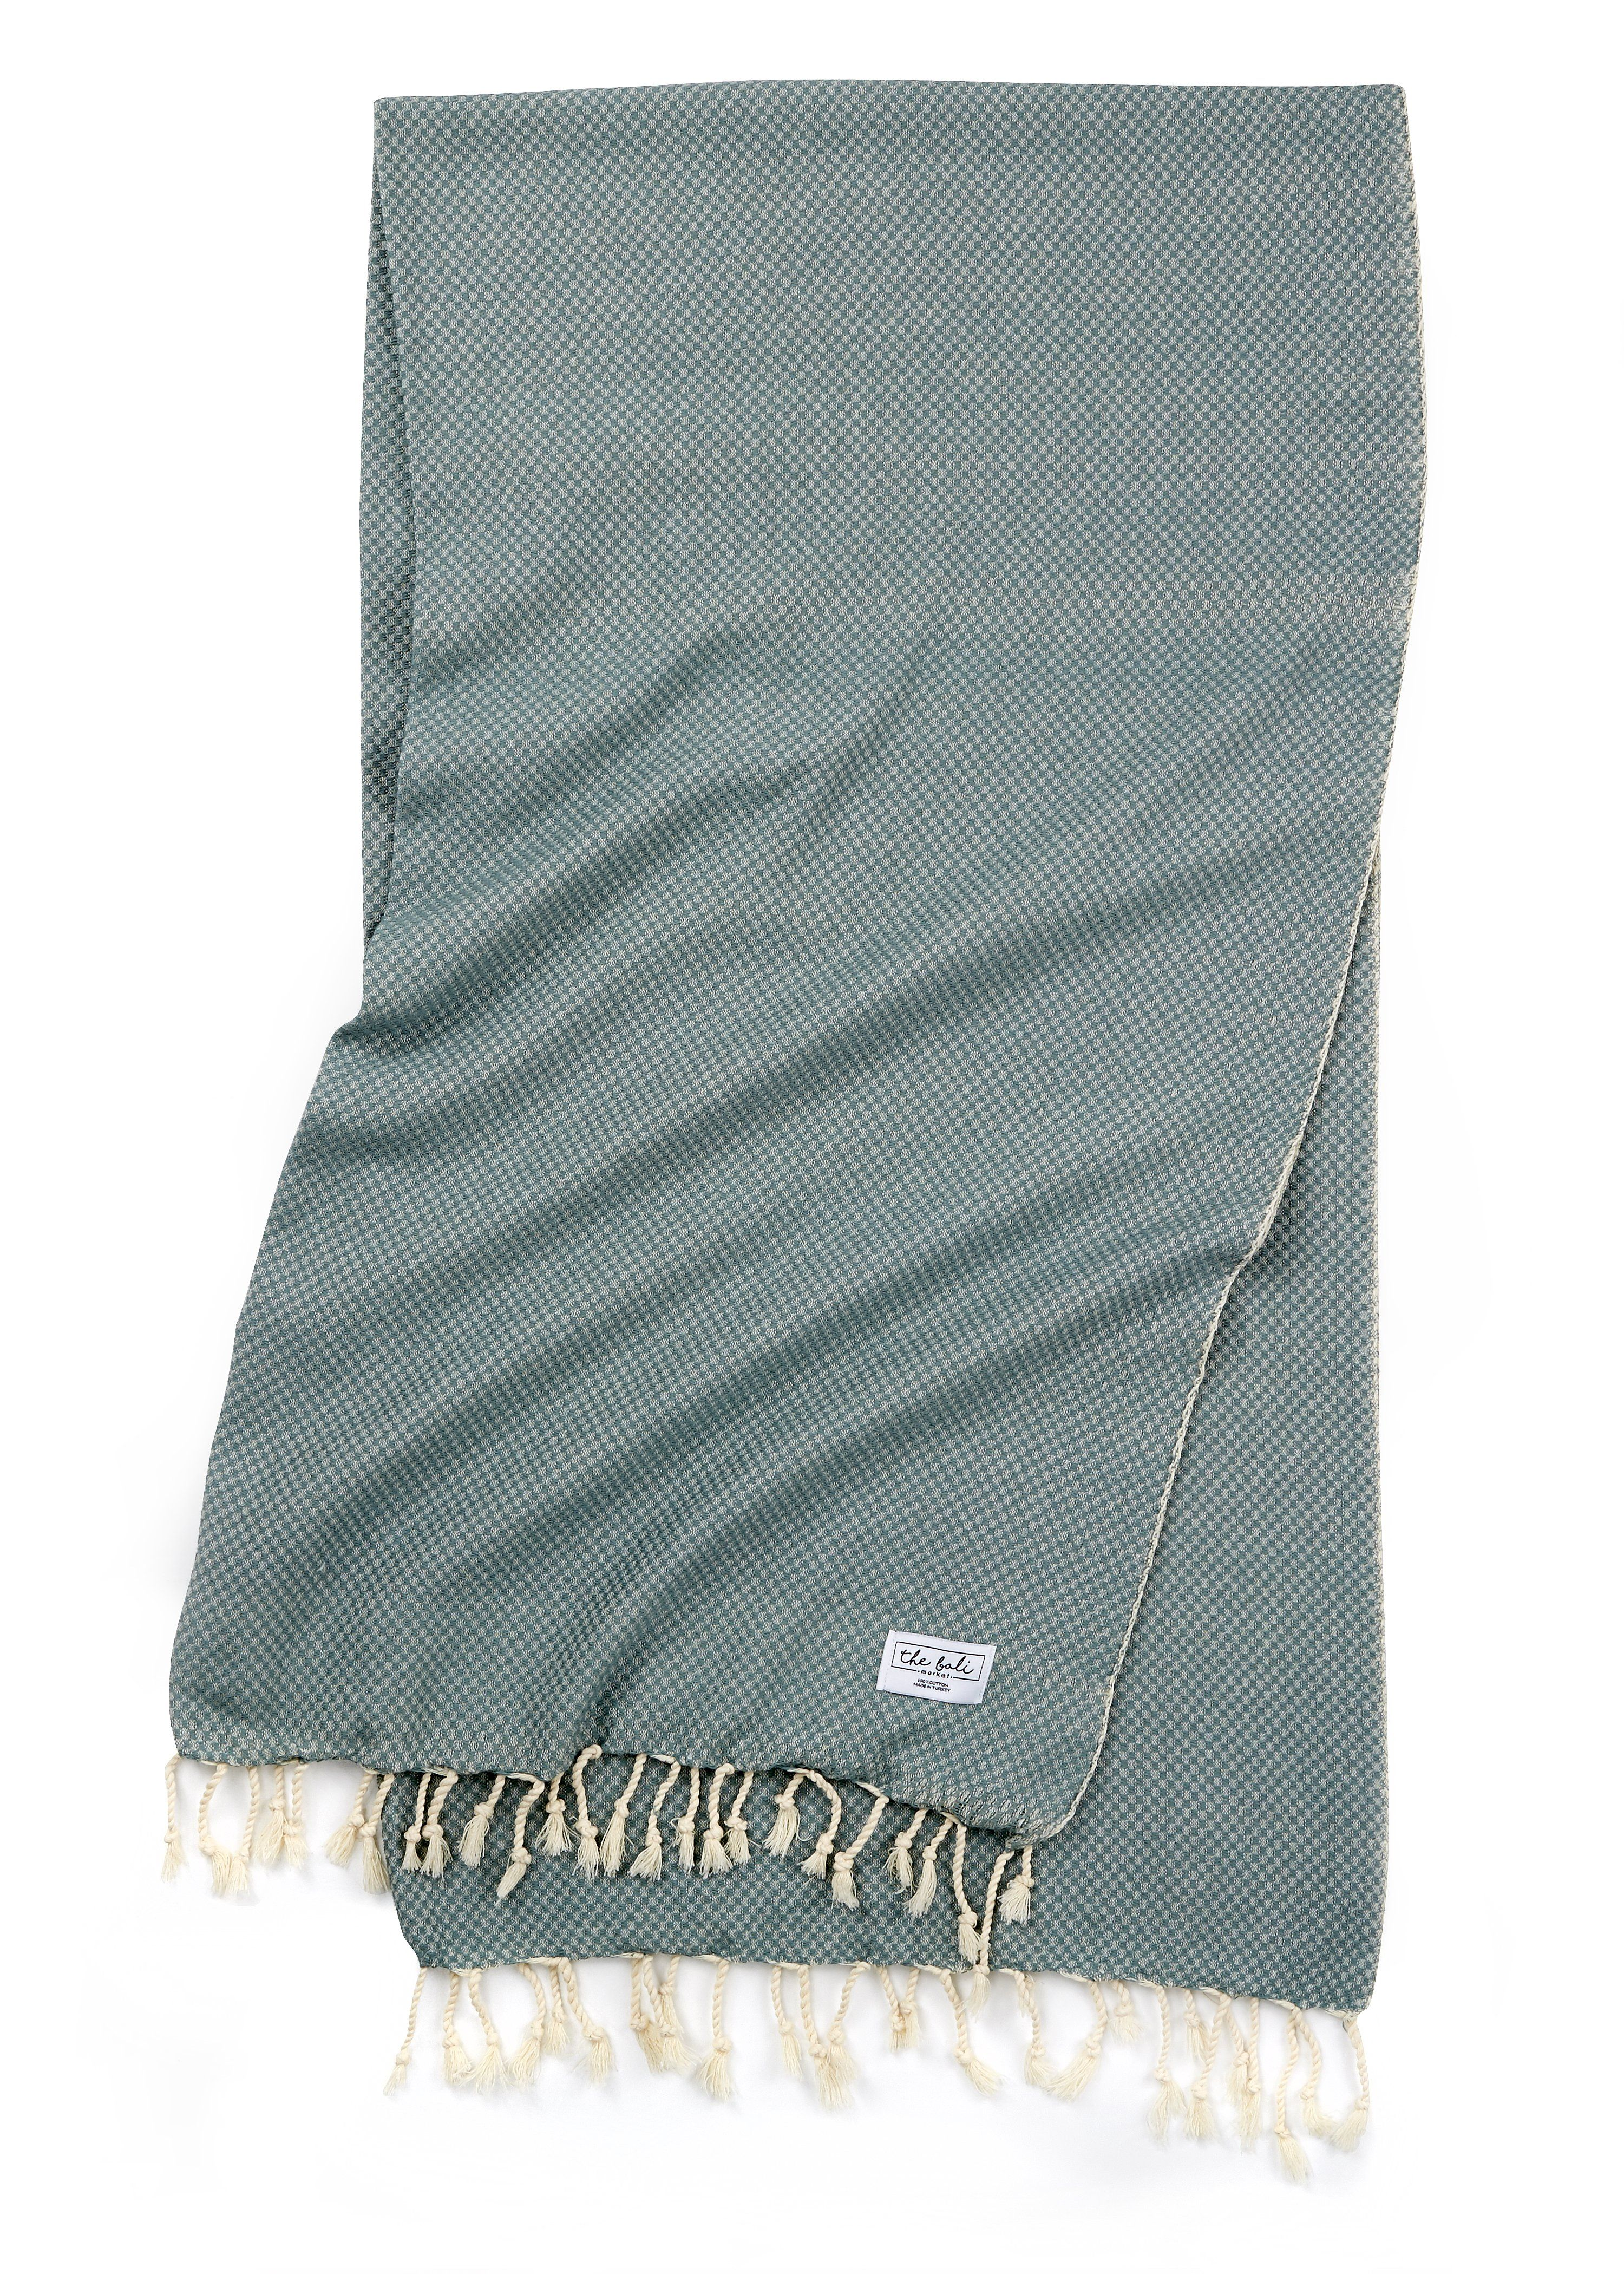 Waffle Weave Bath Towel Green Green Towels Bath Towels Kids